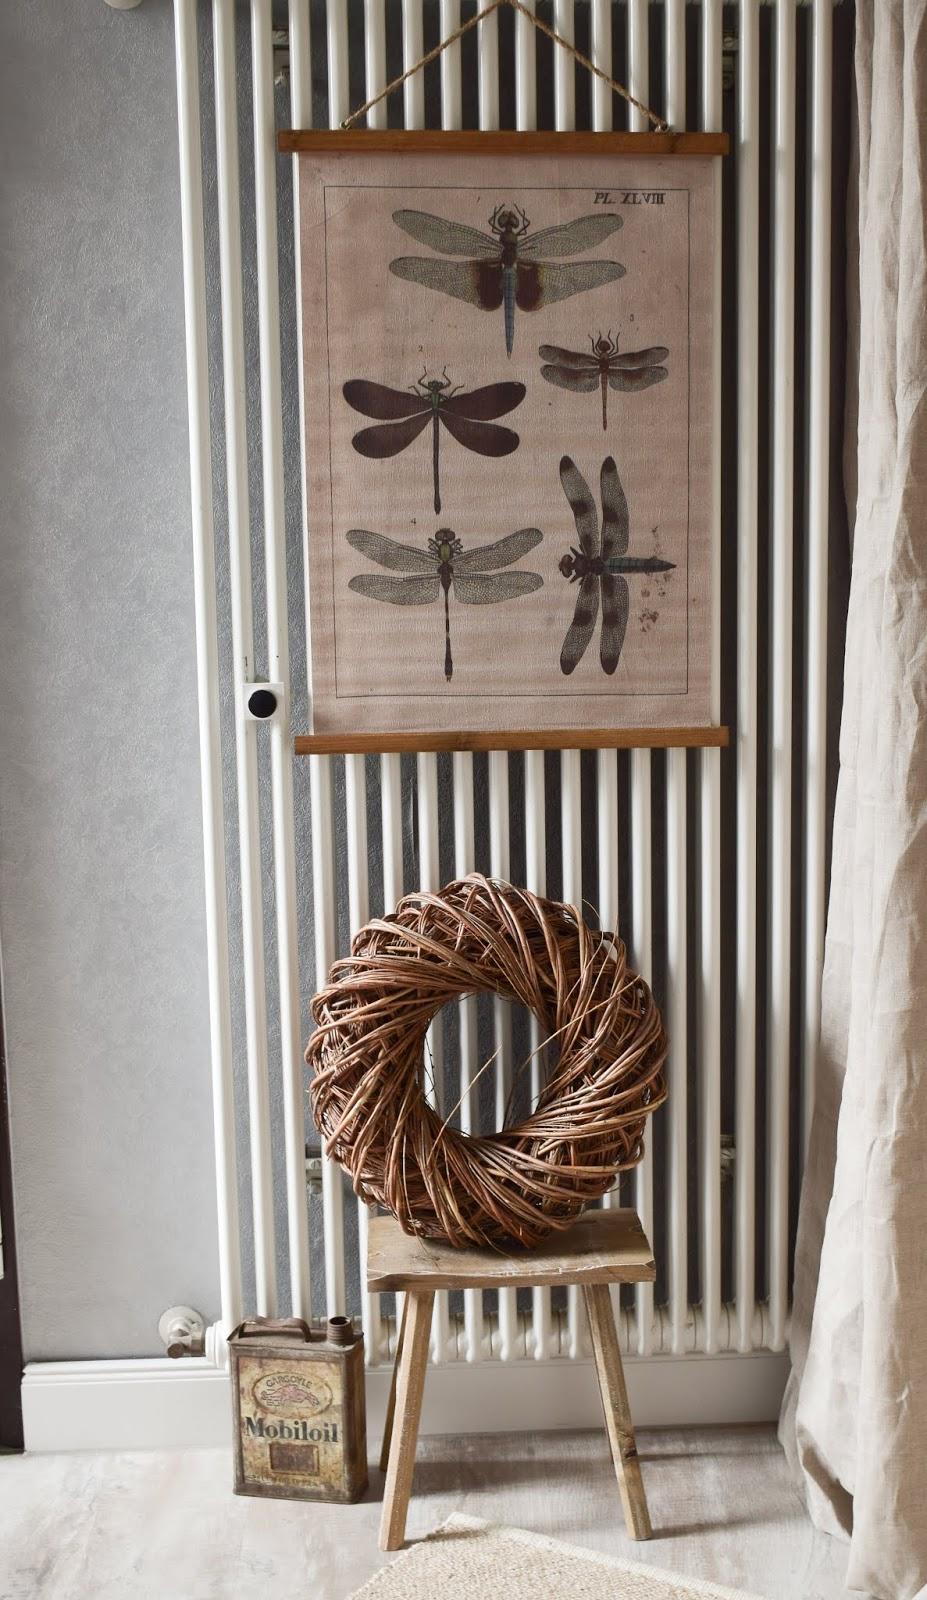 Dekoidee Heizkörper Verschönerung Kaschieren Deko dekorieren